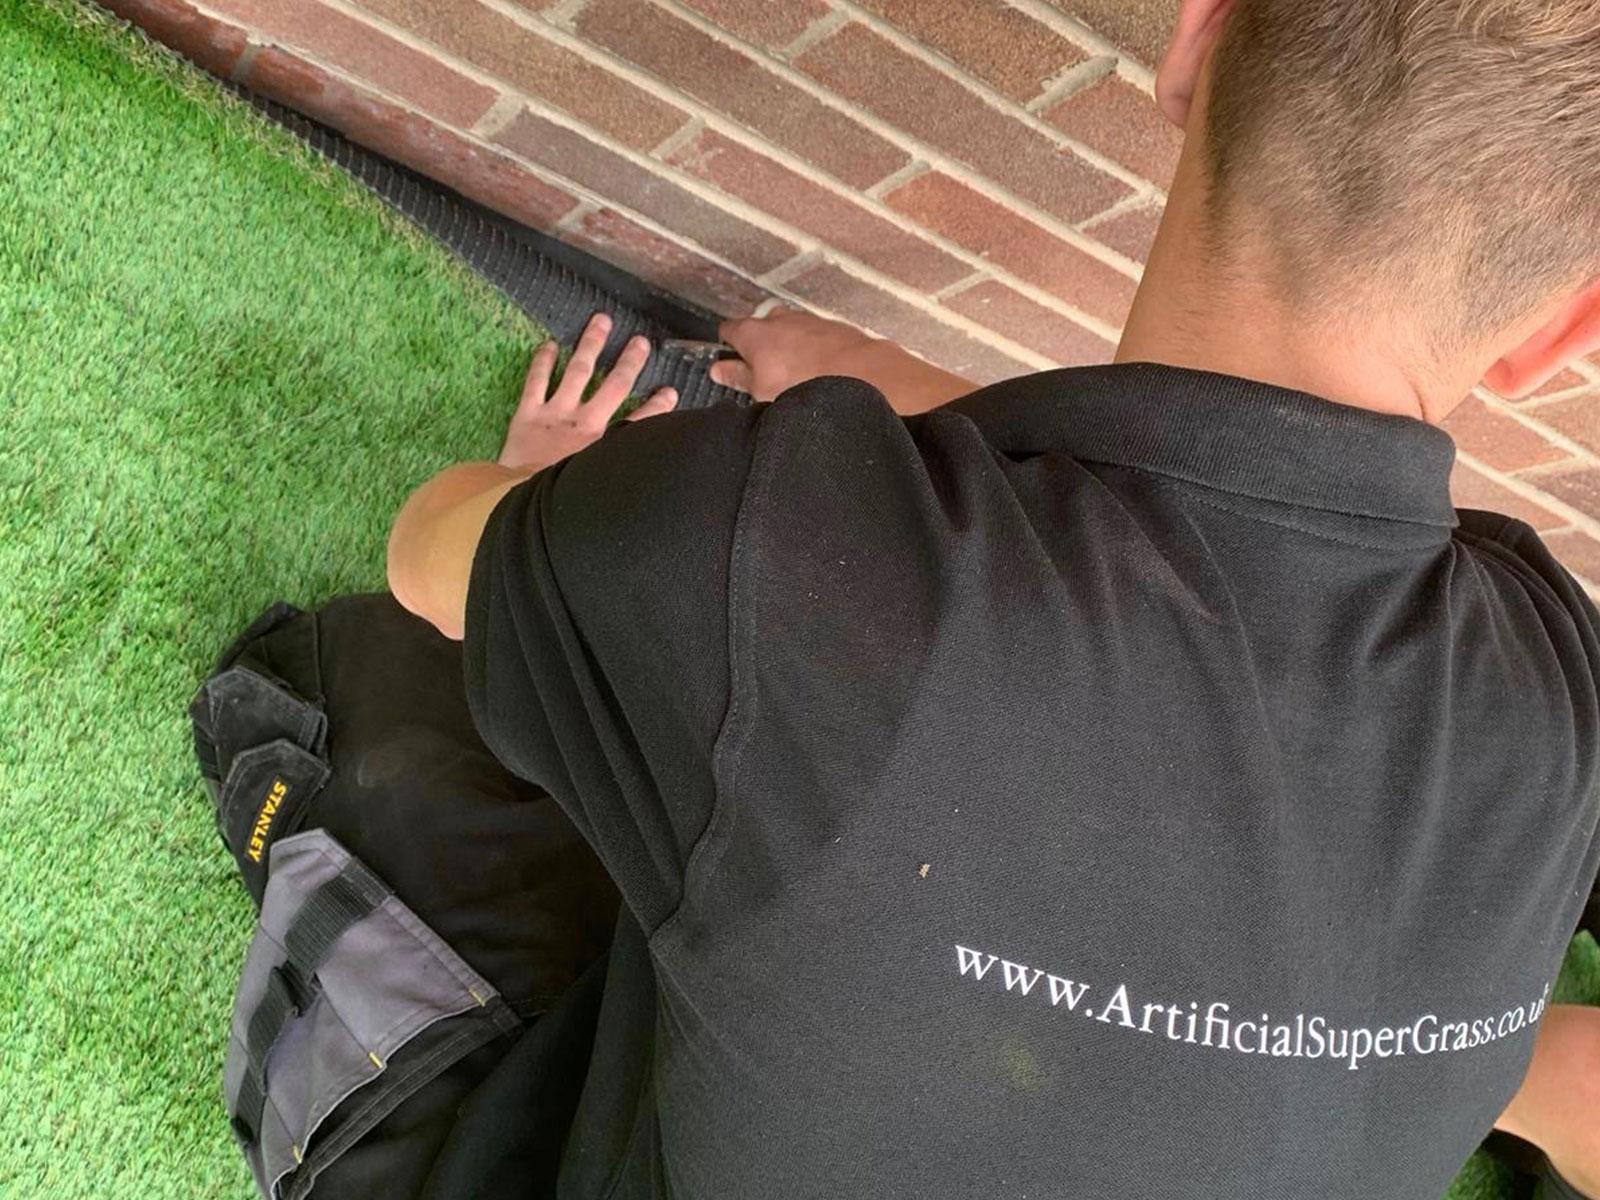 Astro Turf Wrexham Artificial Super Grass